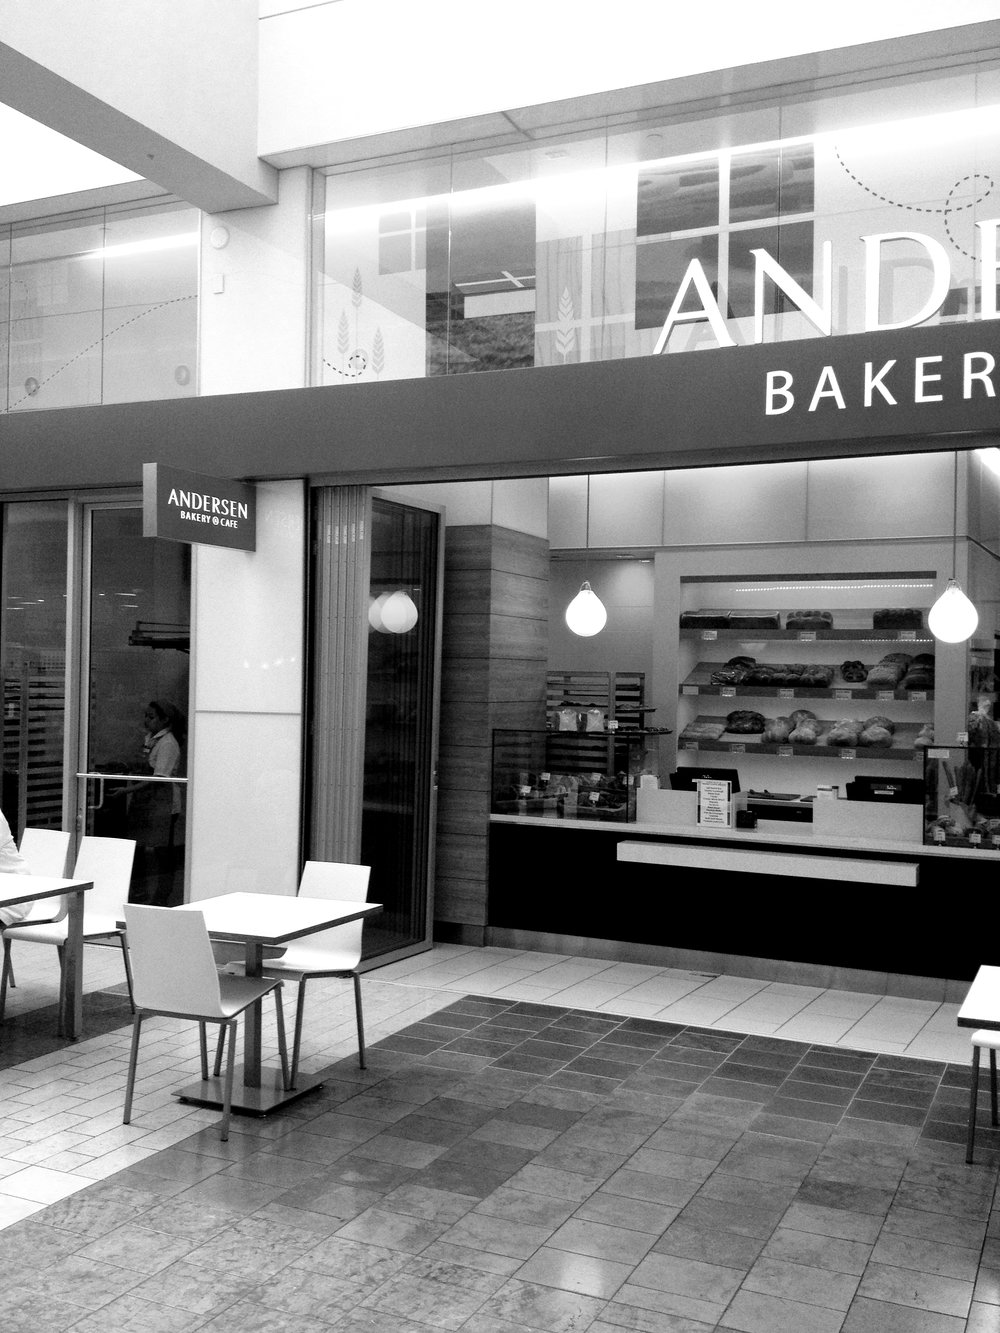 Patron seating area.Anderson Bakery (Oakridge Mall, San Jose, CA)